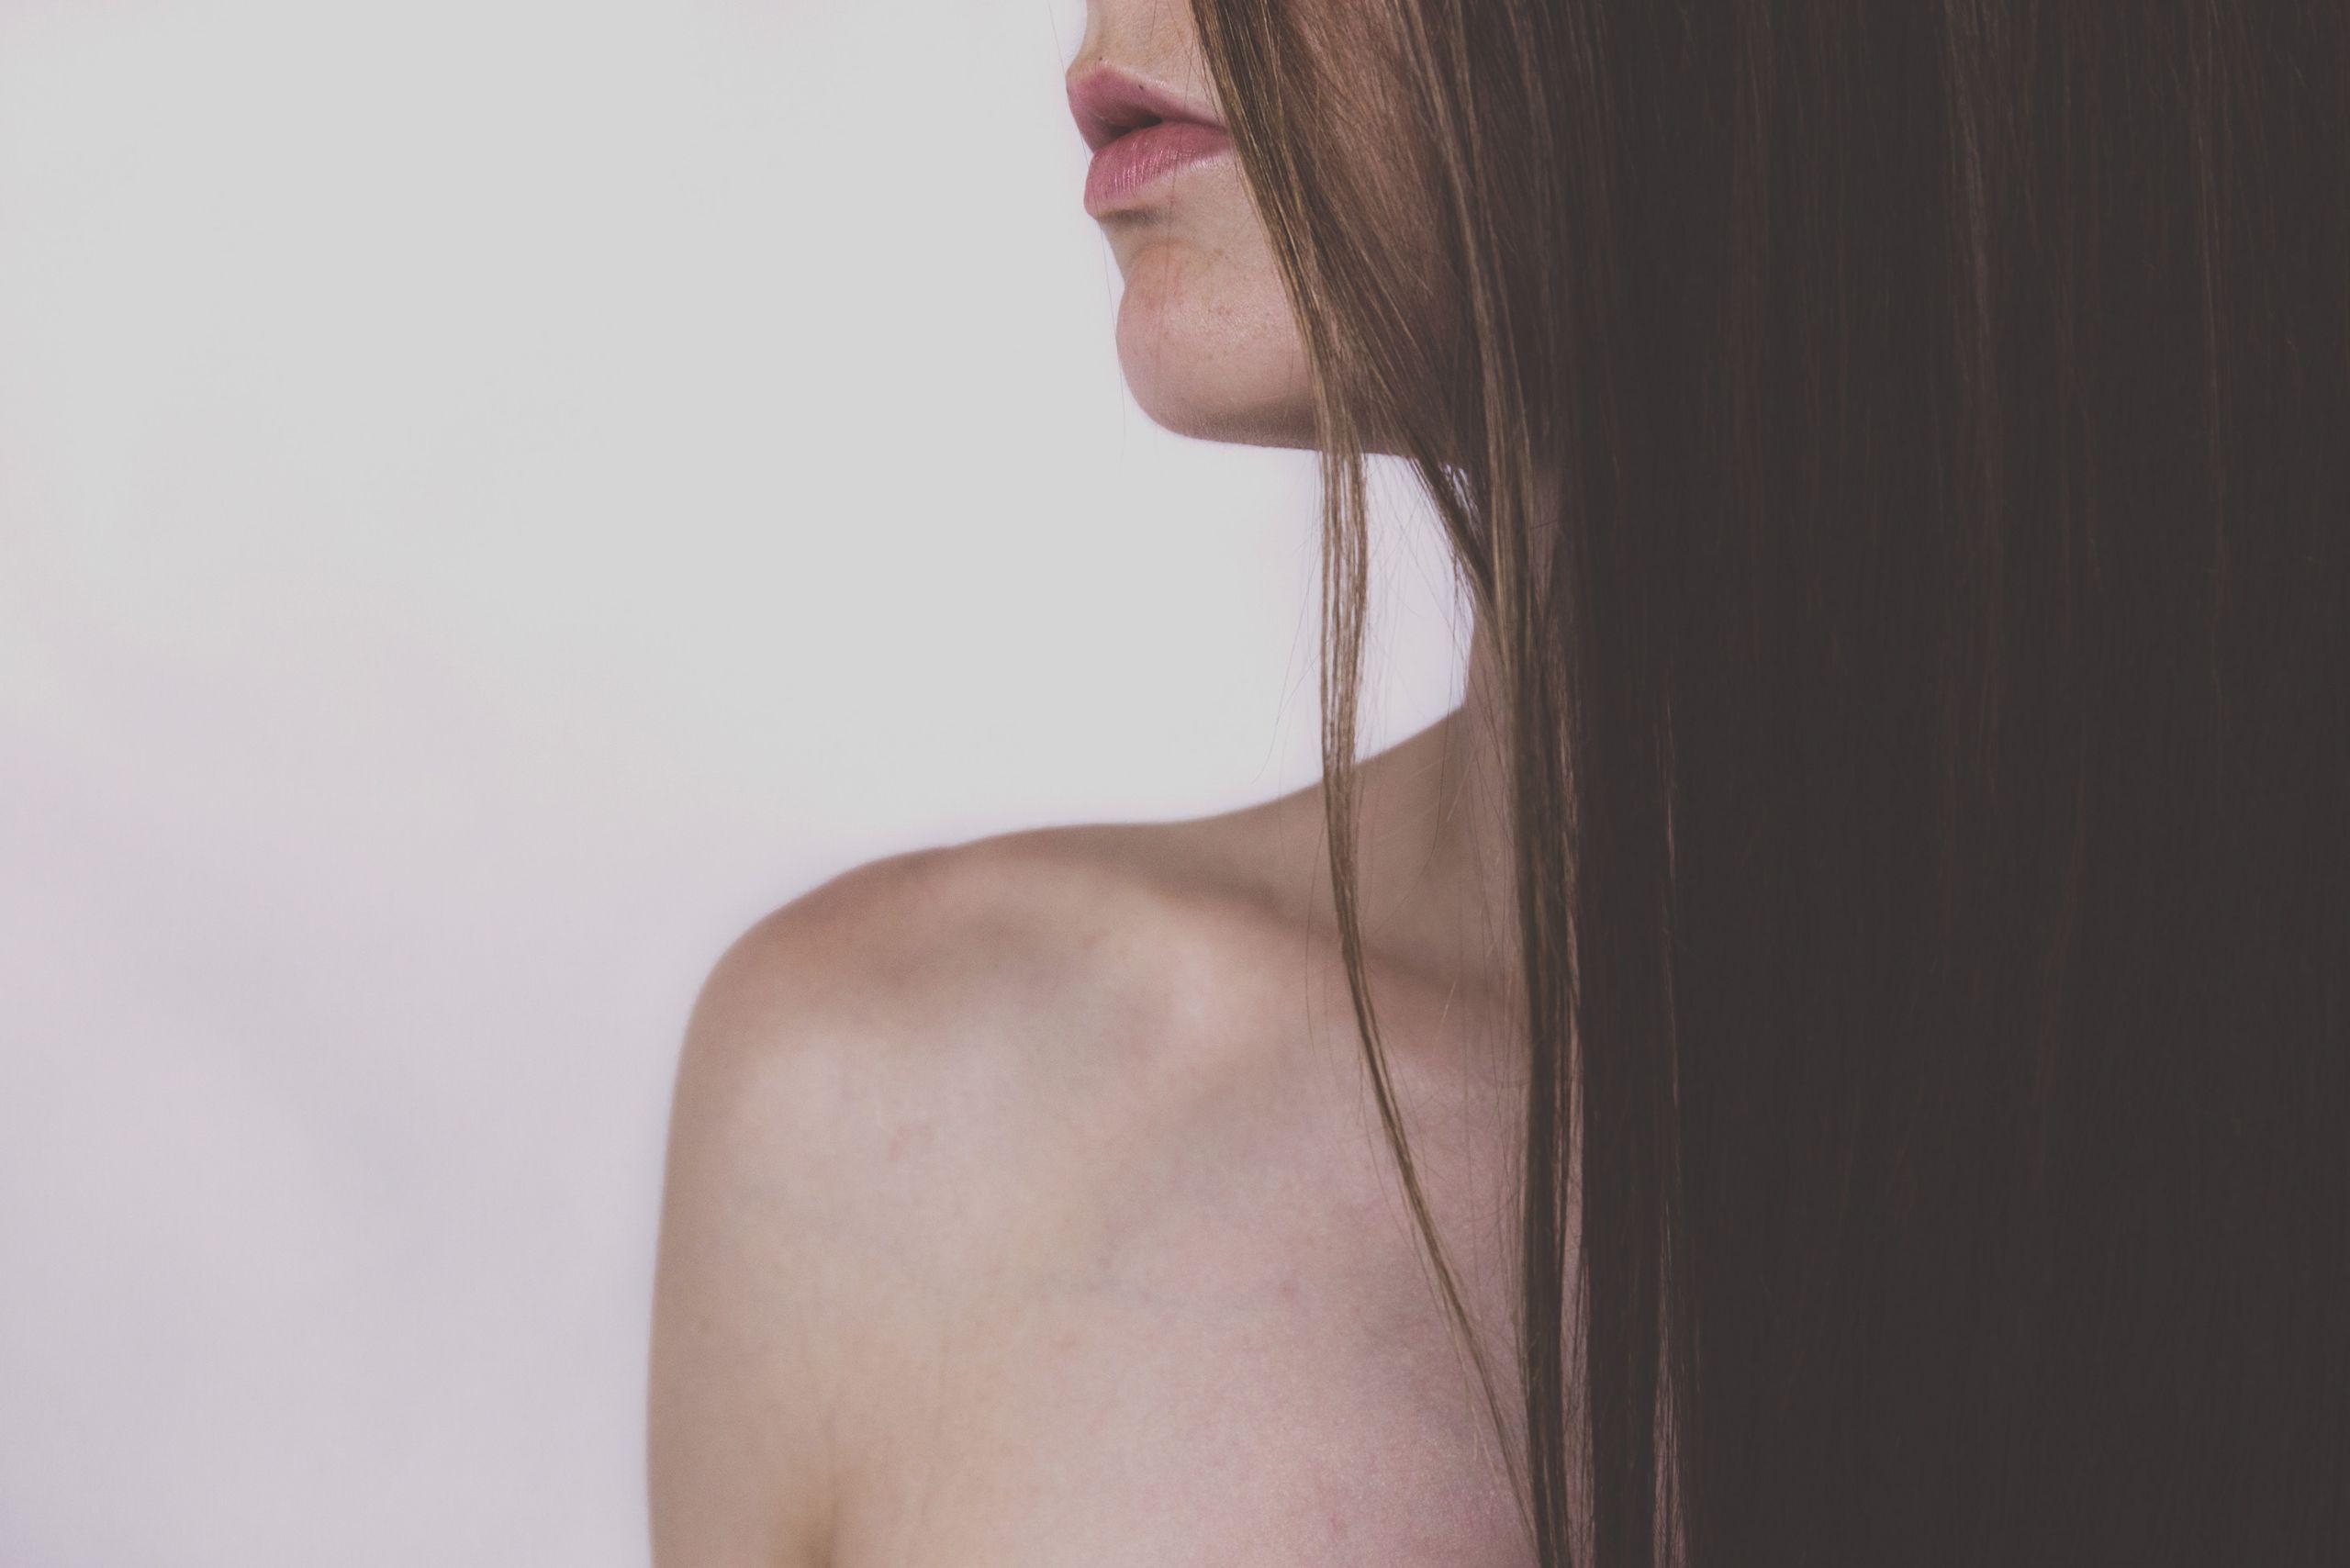 Sådan får du velplejet hud og sommerglød om vinteren